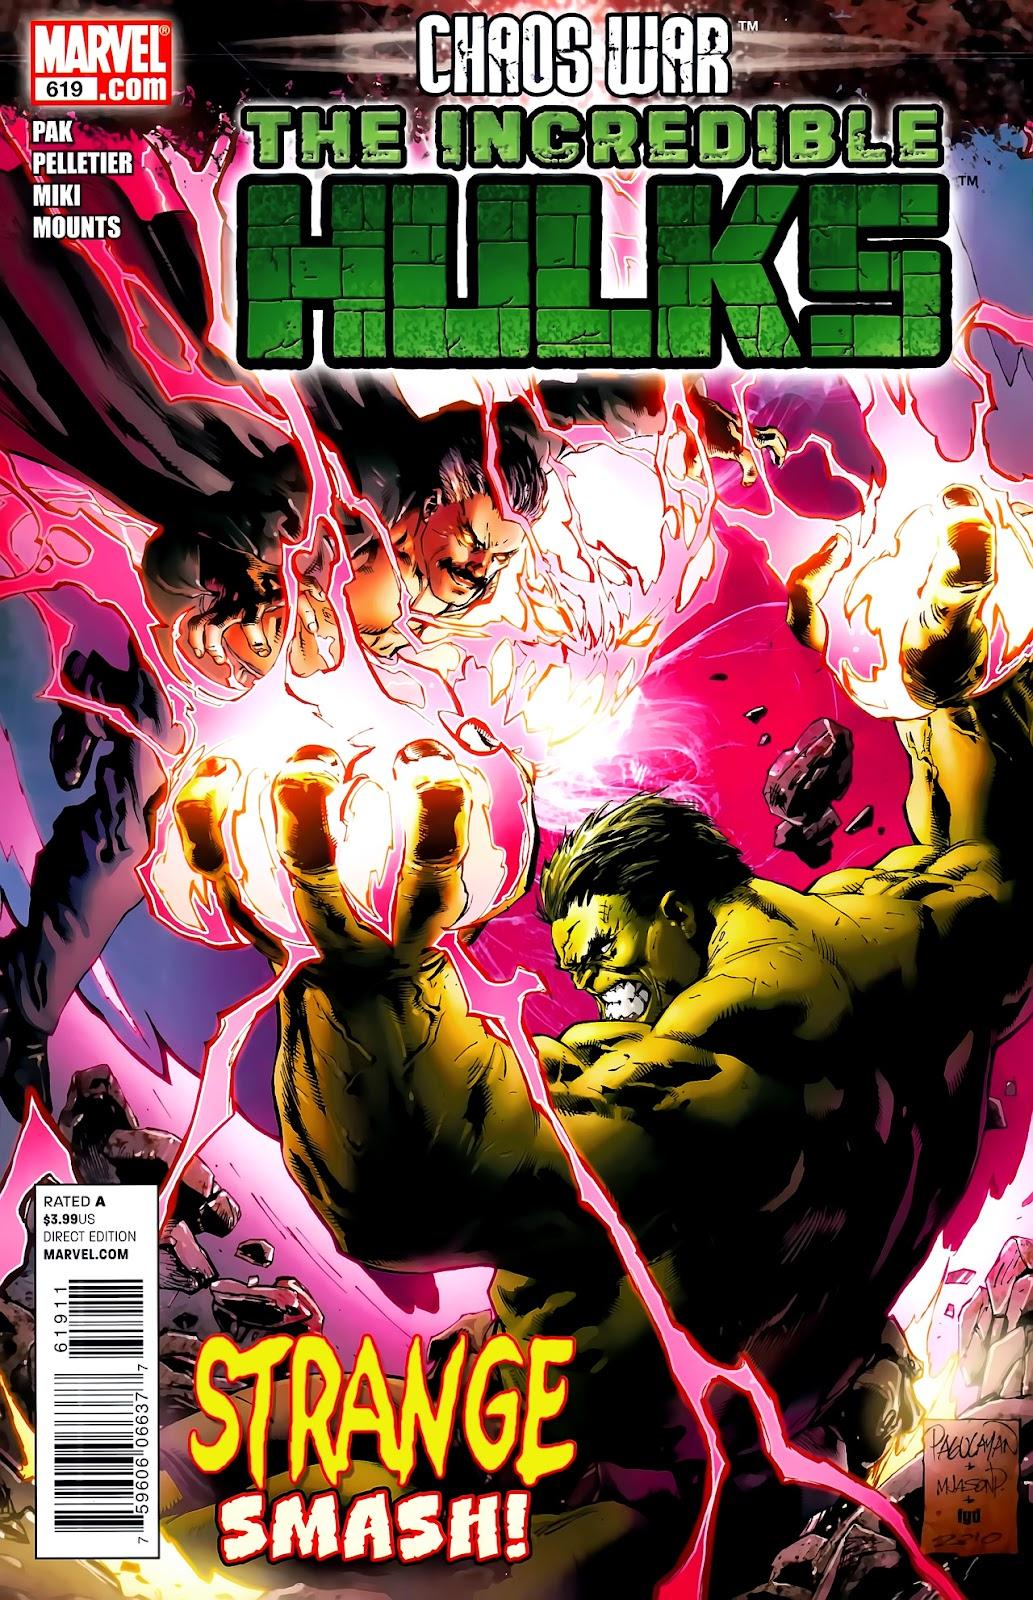 Incredible Hulks (2010) Issue #619 #9 - English 1